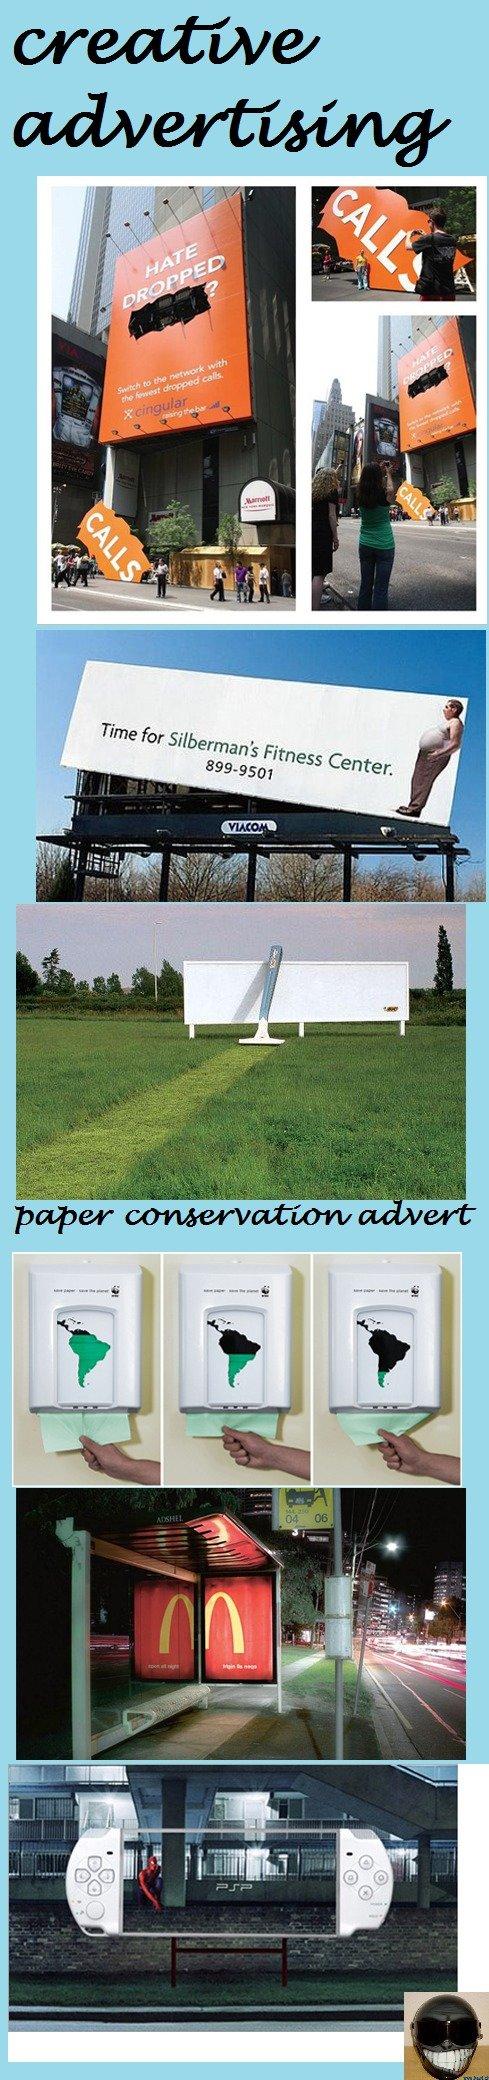 creative advertising comp. . creative advertising comp